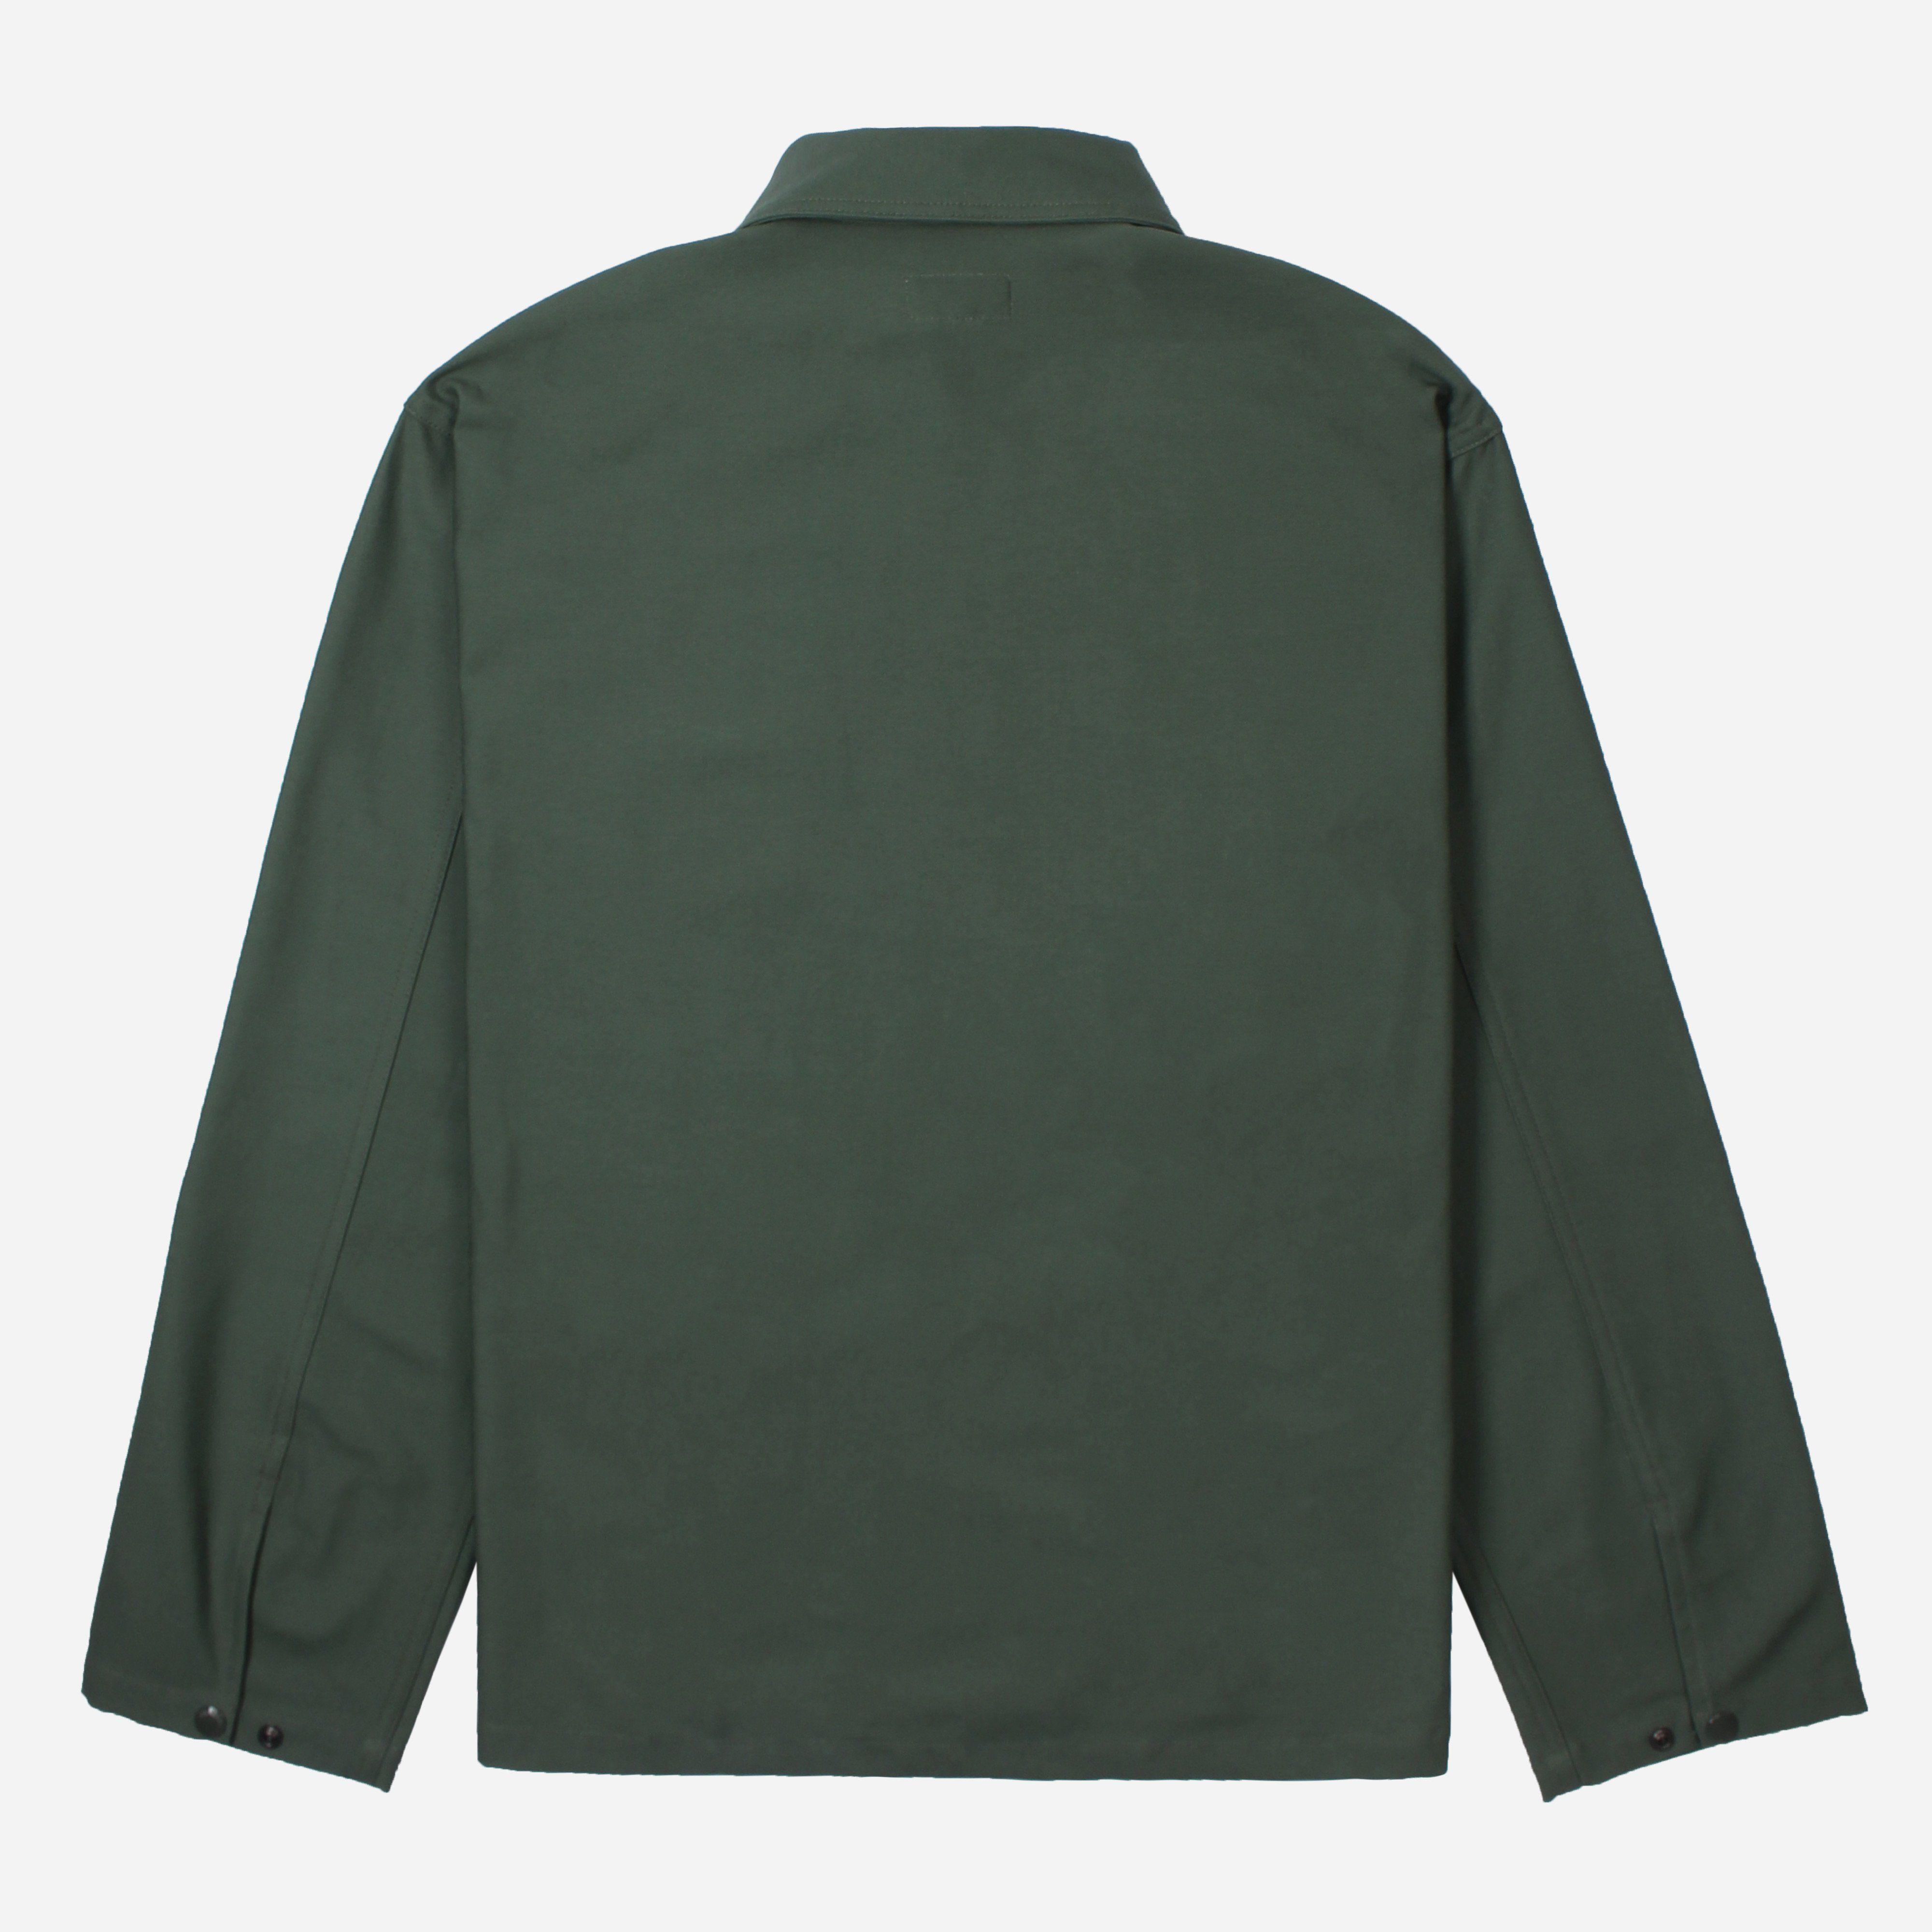 Engineered Garments Workaday Army Shirt